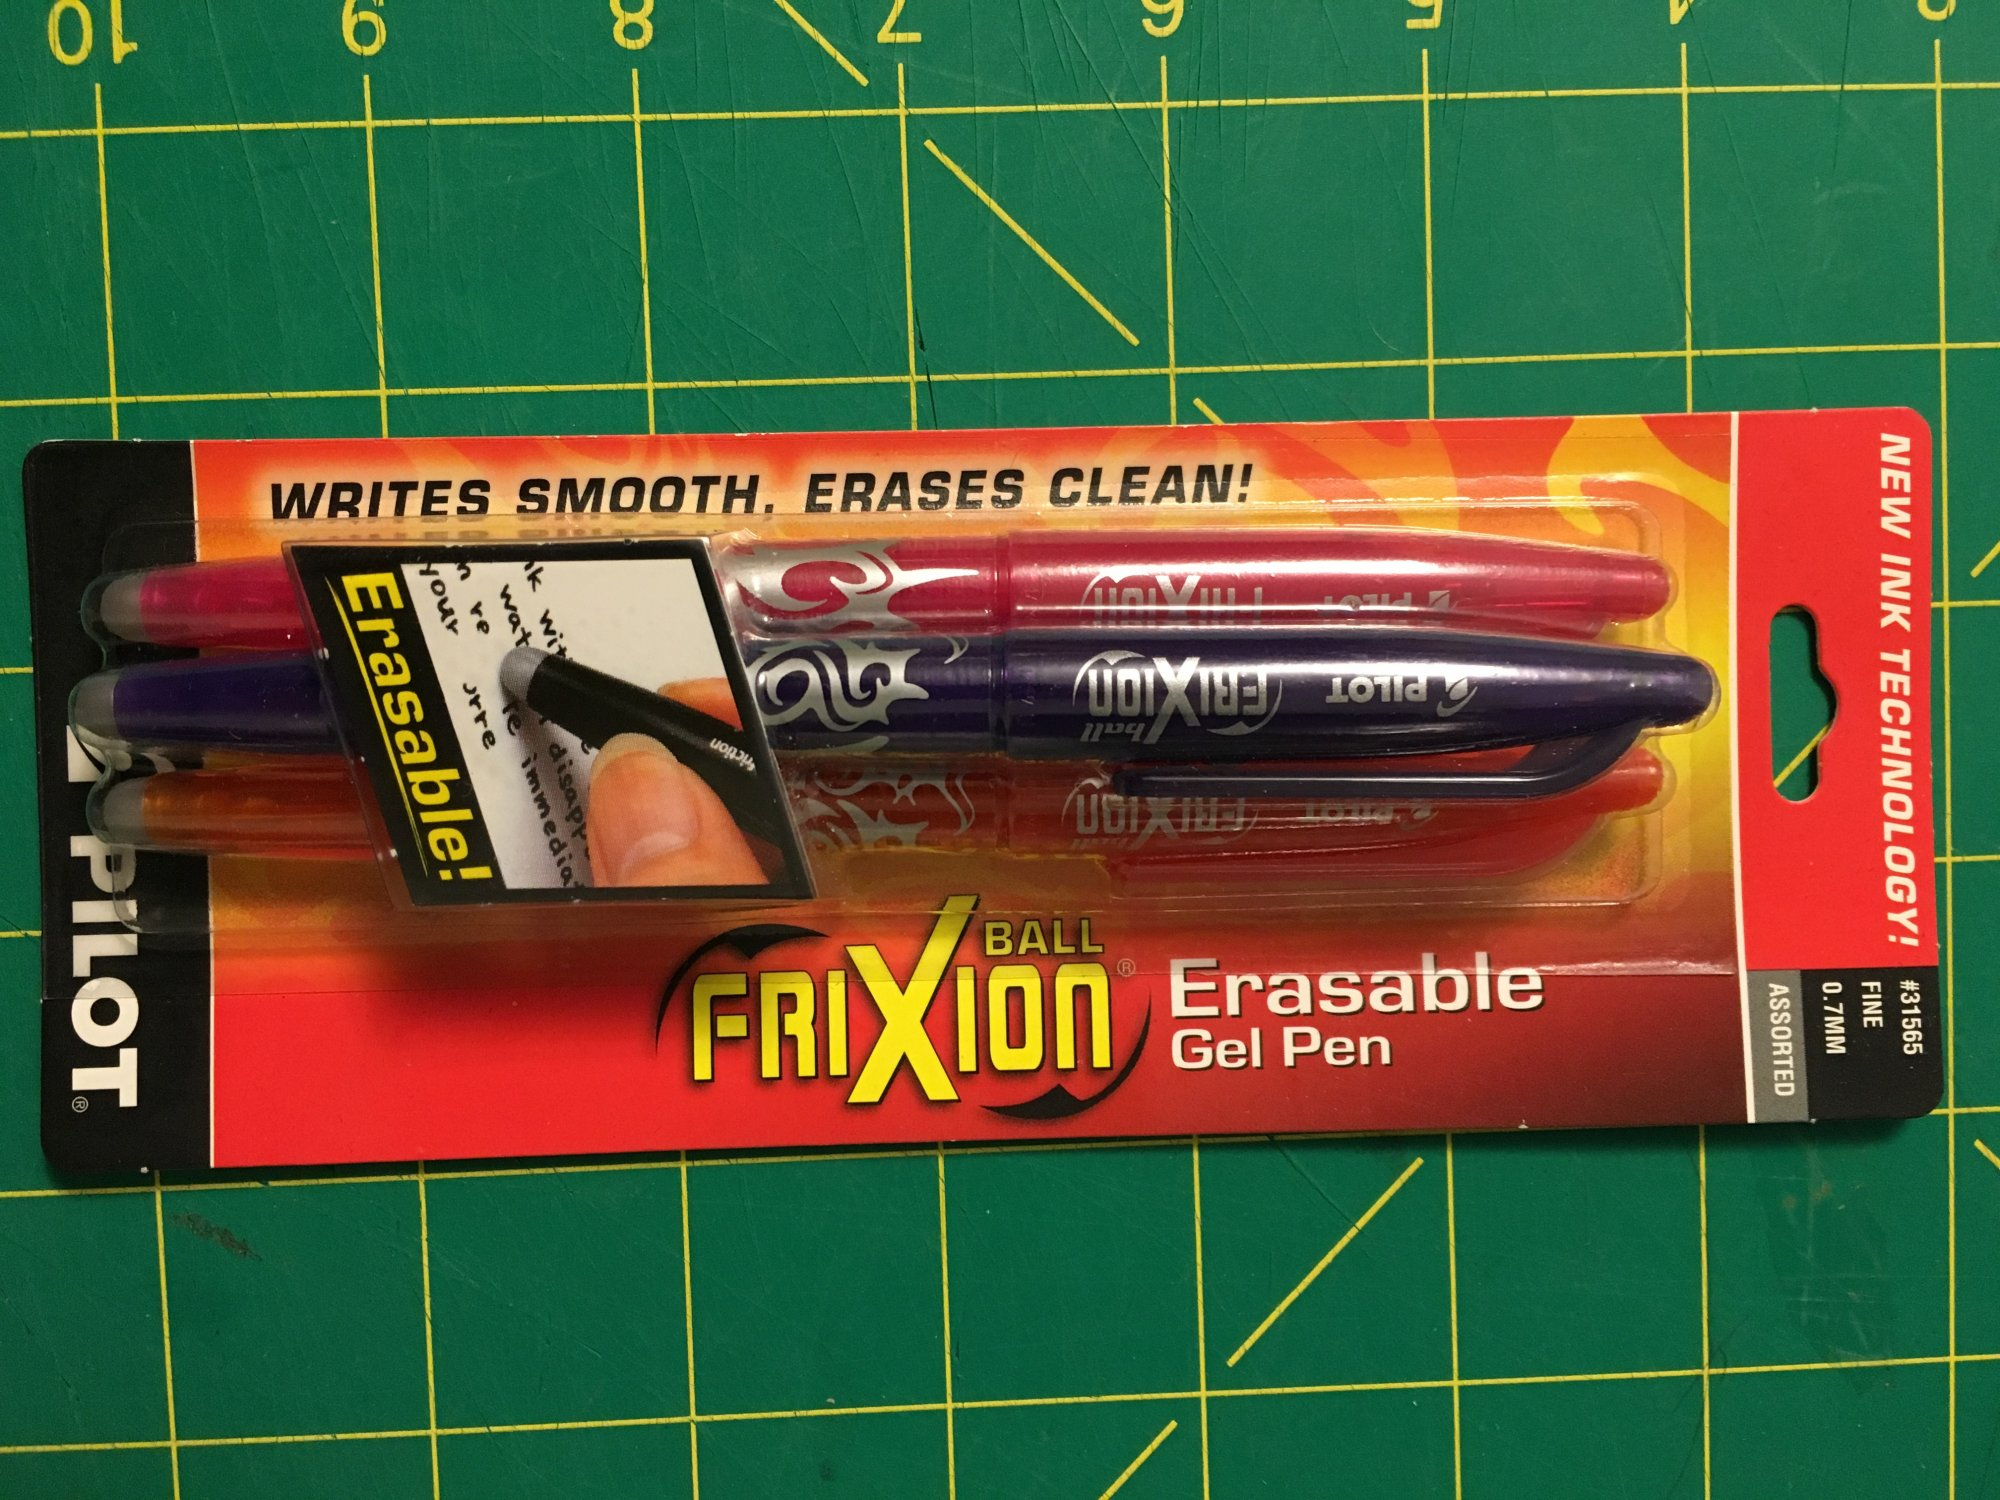 PILOT Frixion Erasable Gel Pens (set of 3)